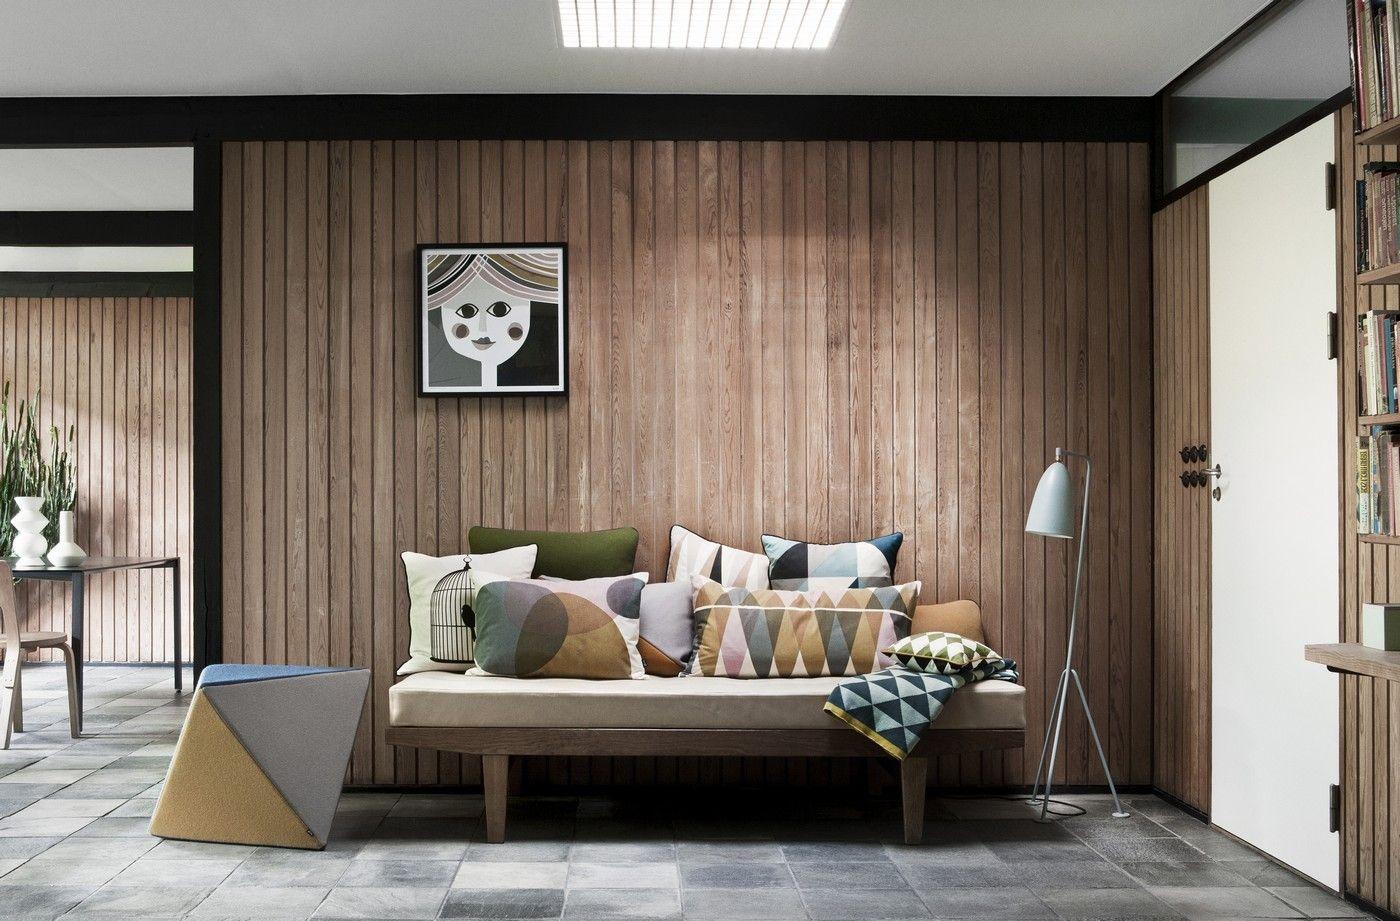 melt klein 60 x 40 cm ferm living kissen. Black Bedroom Furniture Sets. Home Design Ideas